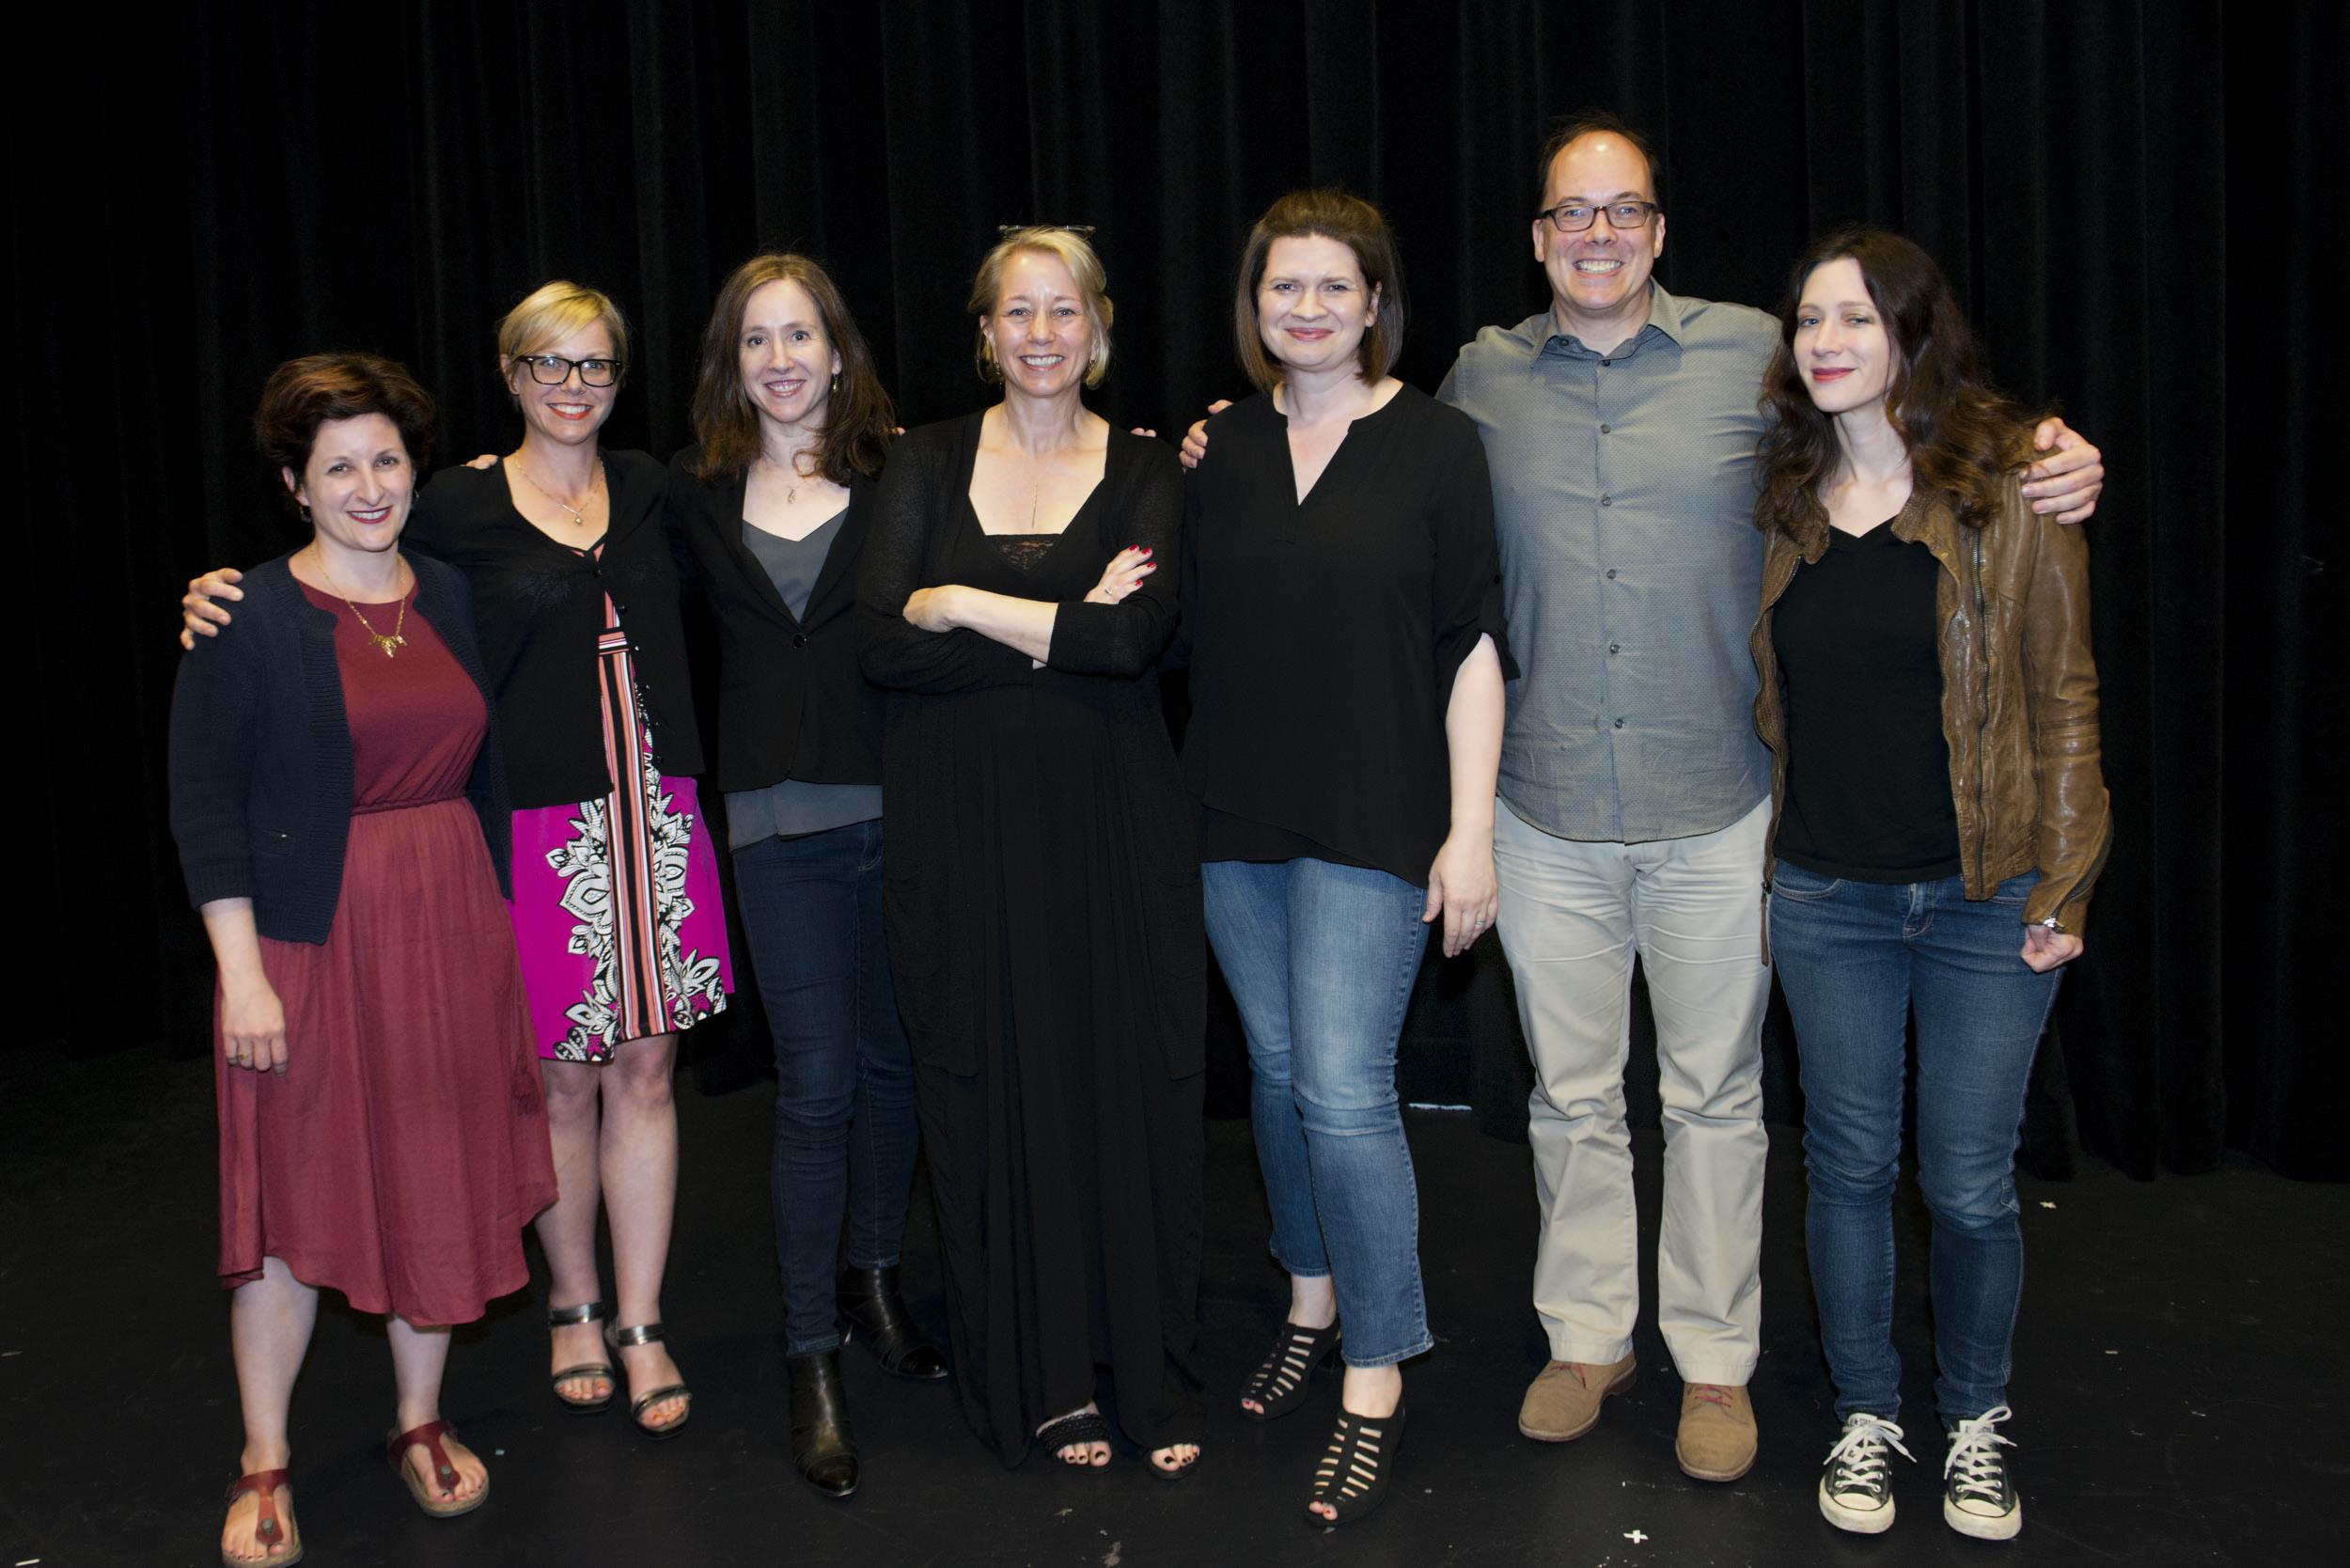 The cast of our show on June 9th, 2016: Meg Leder, Rita Arens, Beth Hahn, Laura Lippman, Emmy Laybourne, Michael Northrop and Marie Rutkoski